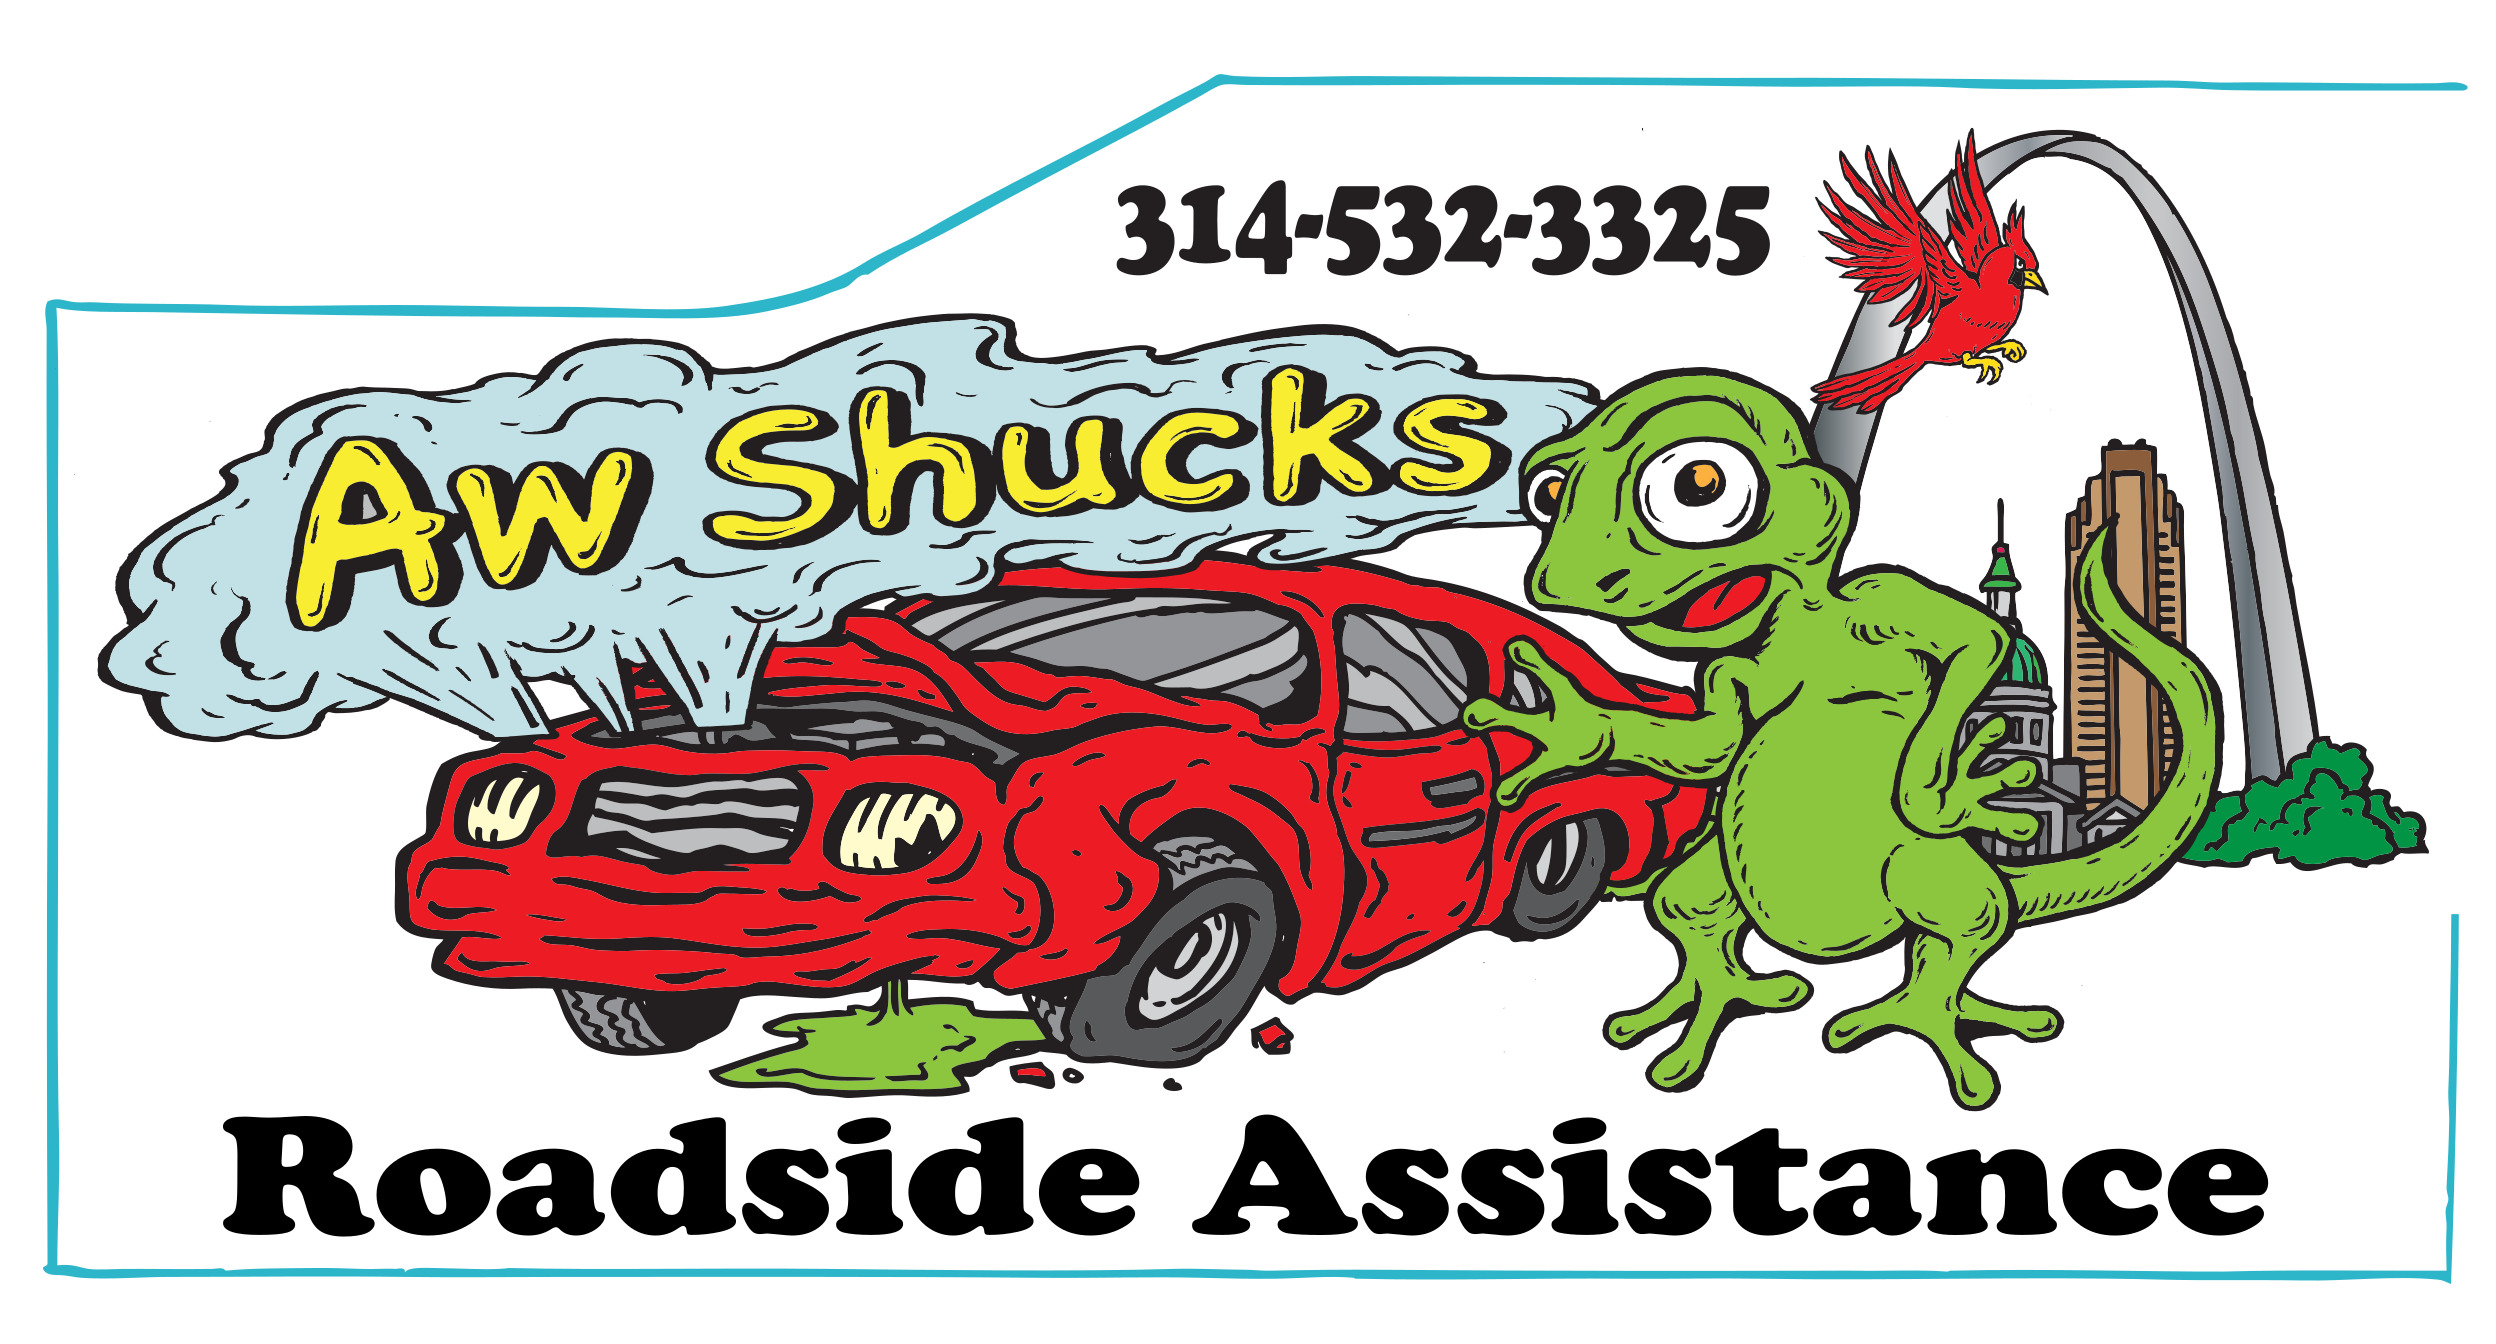 """Aw Shucks"" Roadside Assistance cartoon banner with"